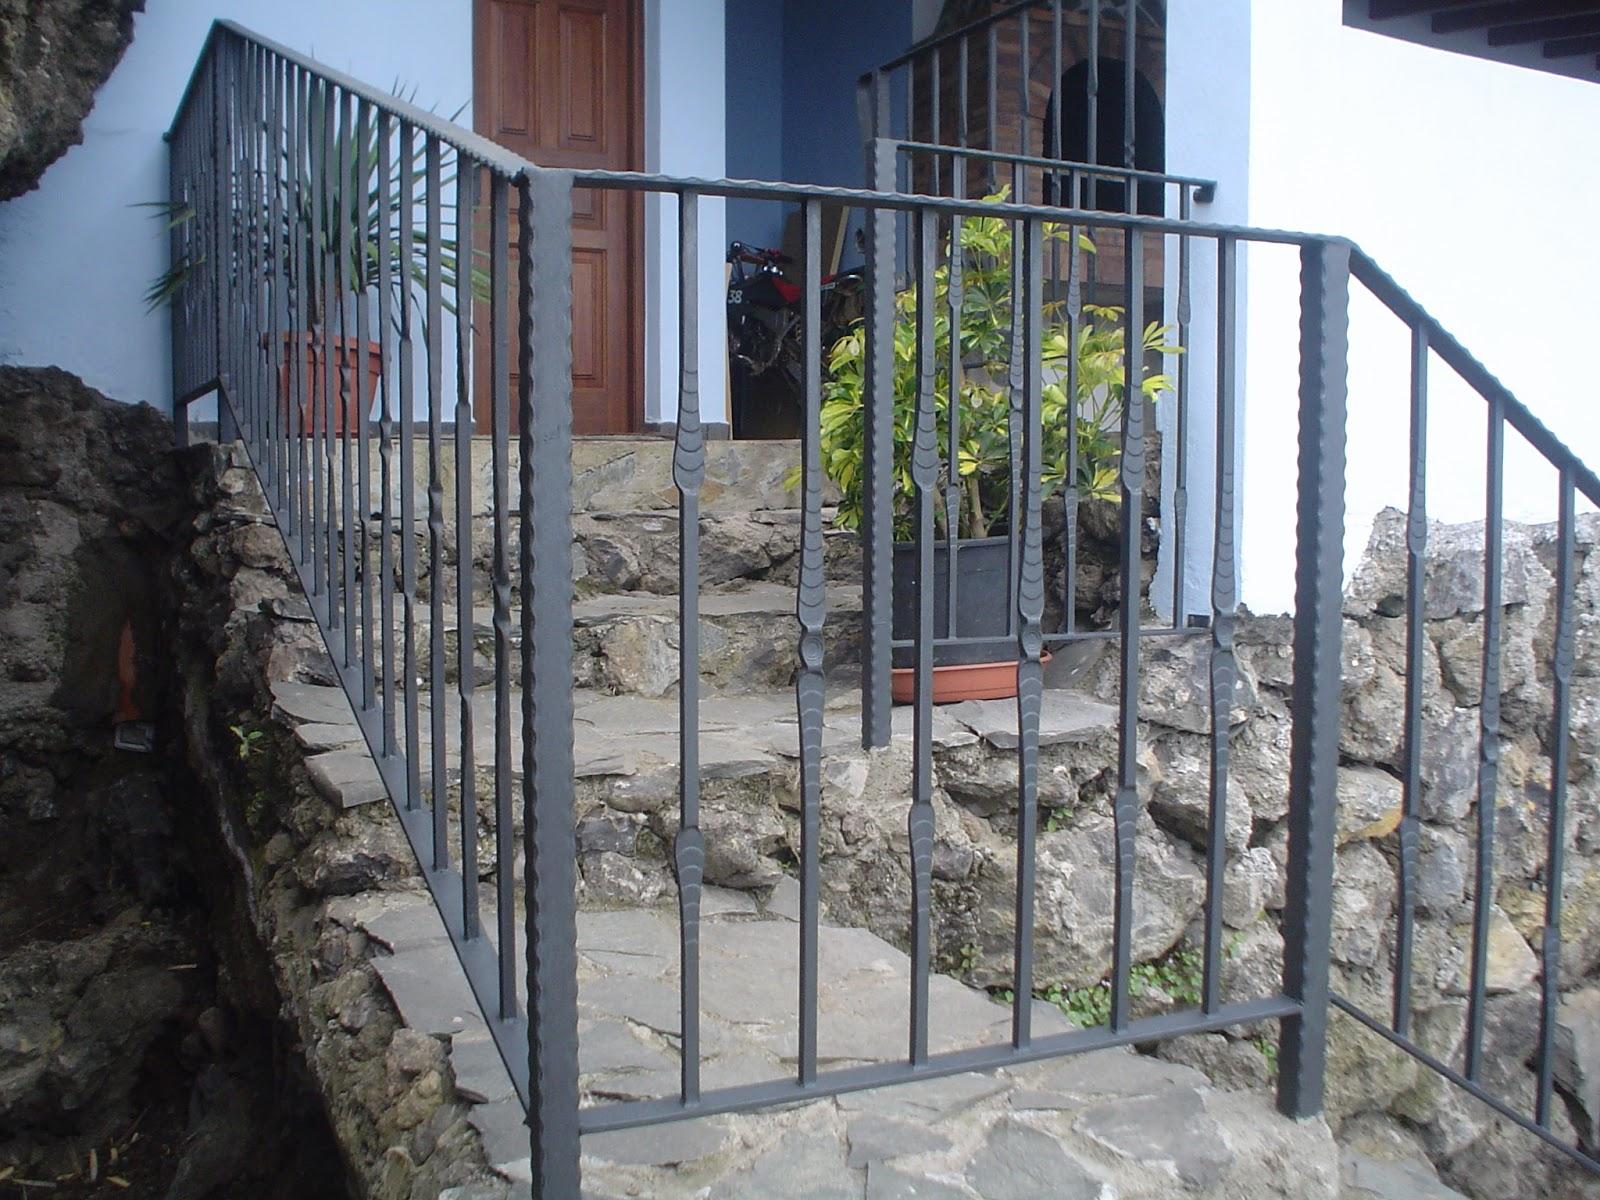 Acero inoxidable tenerife barandas de forja tenerife - Escaleras de hierro forjado ...